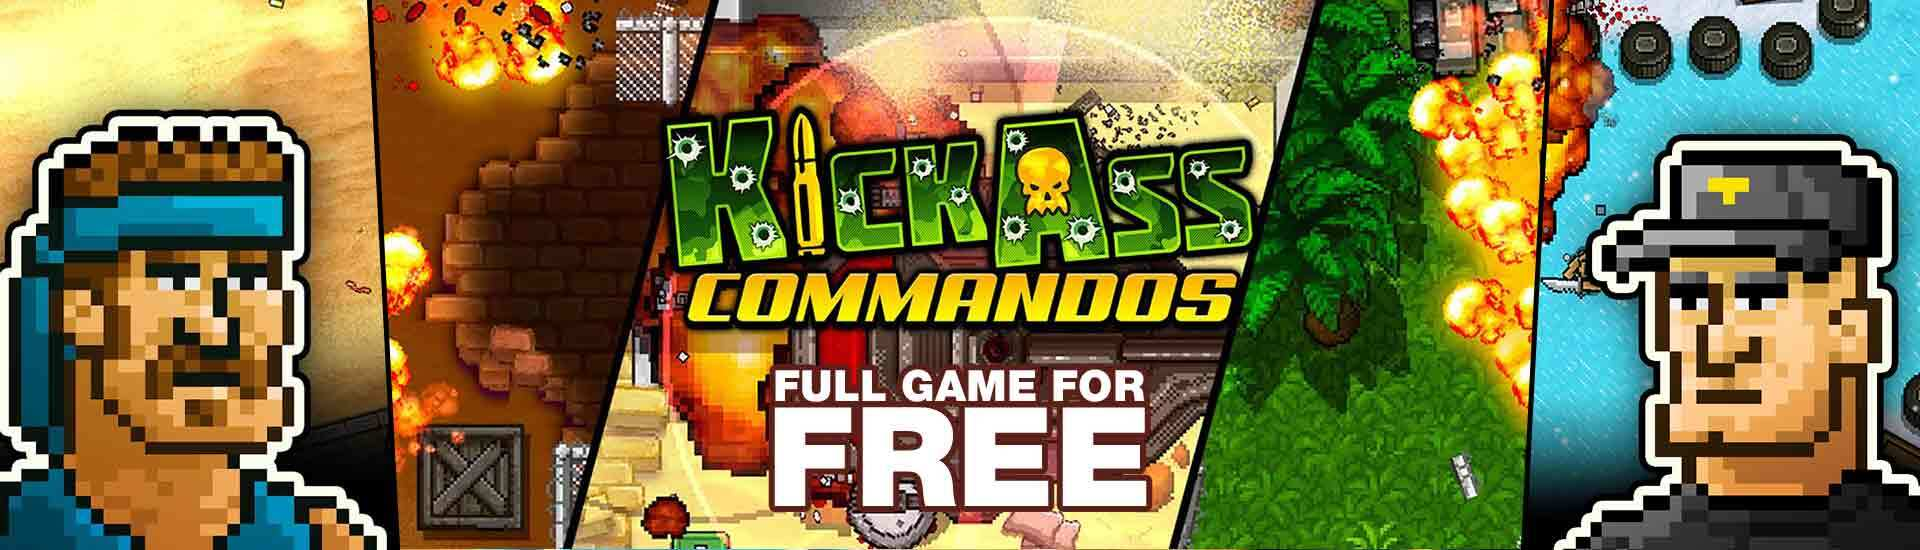 Videojuego Kick Ass Commandos